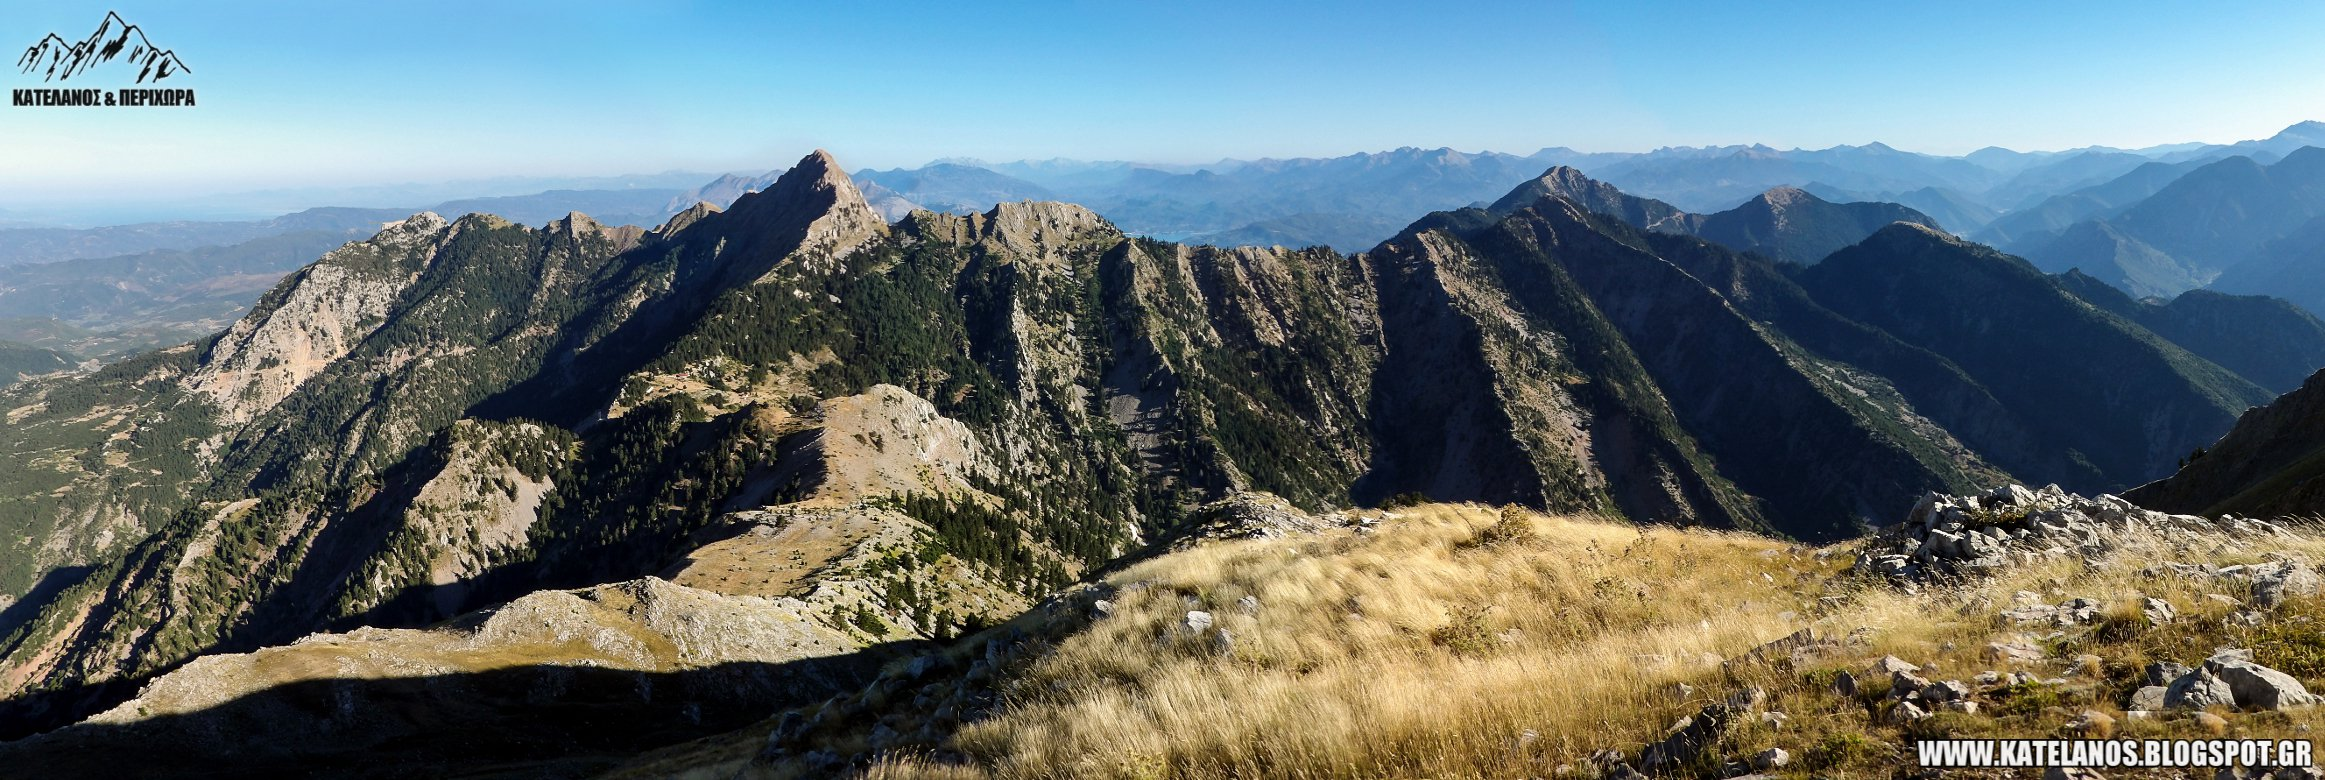 koutpas panaitliko oros φοβερη οροσειρα ελληνικα βουνα